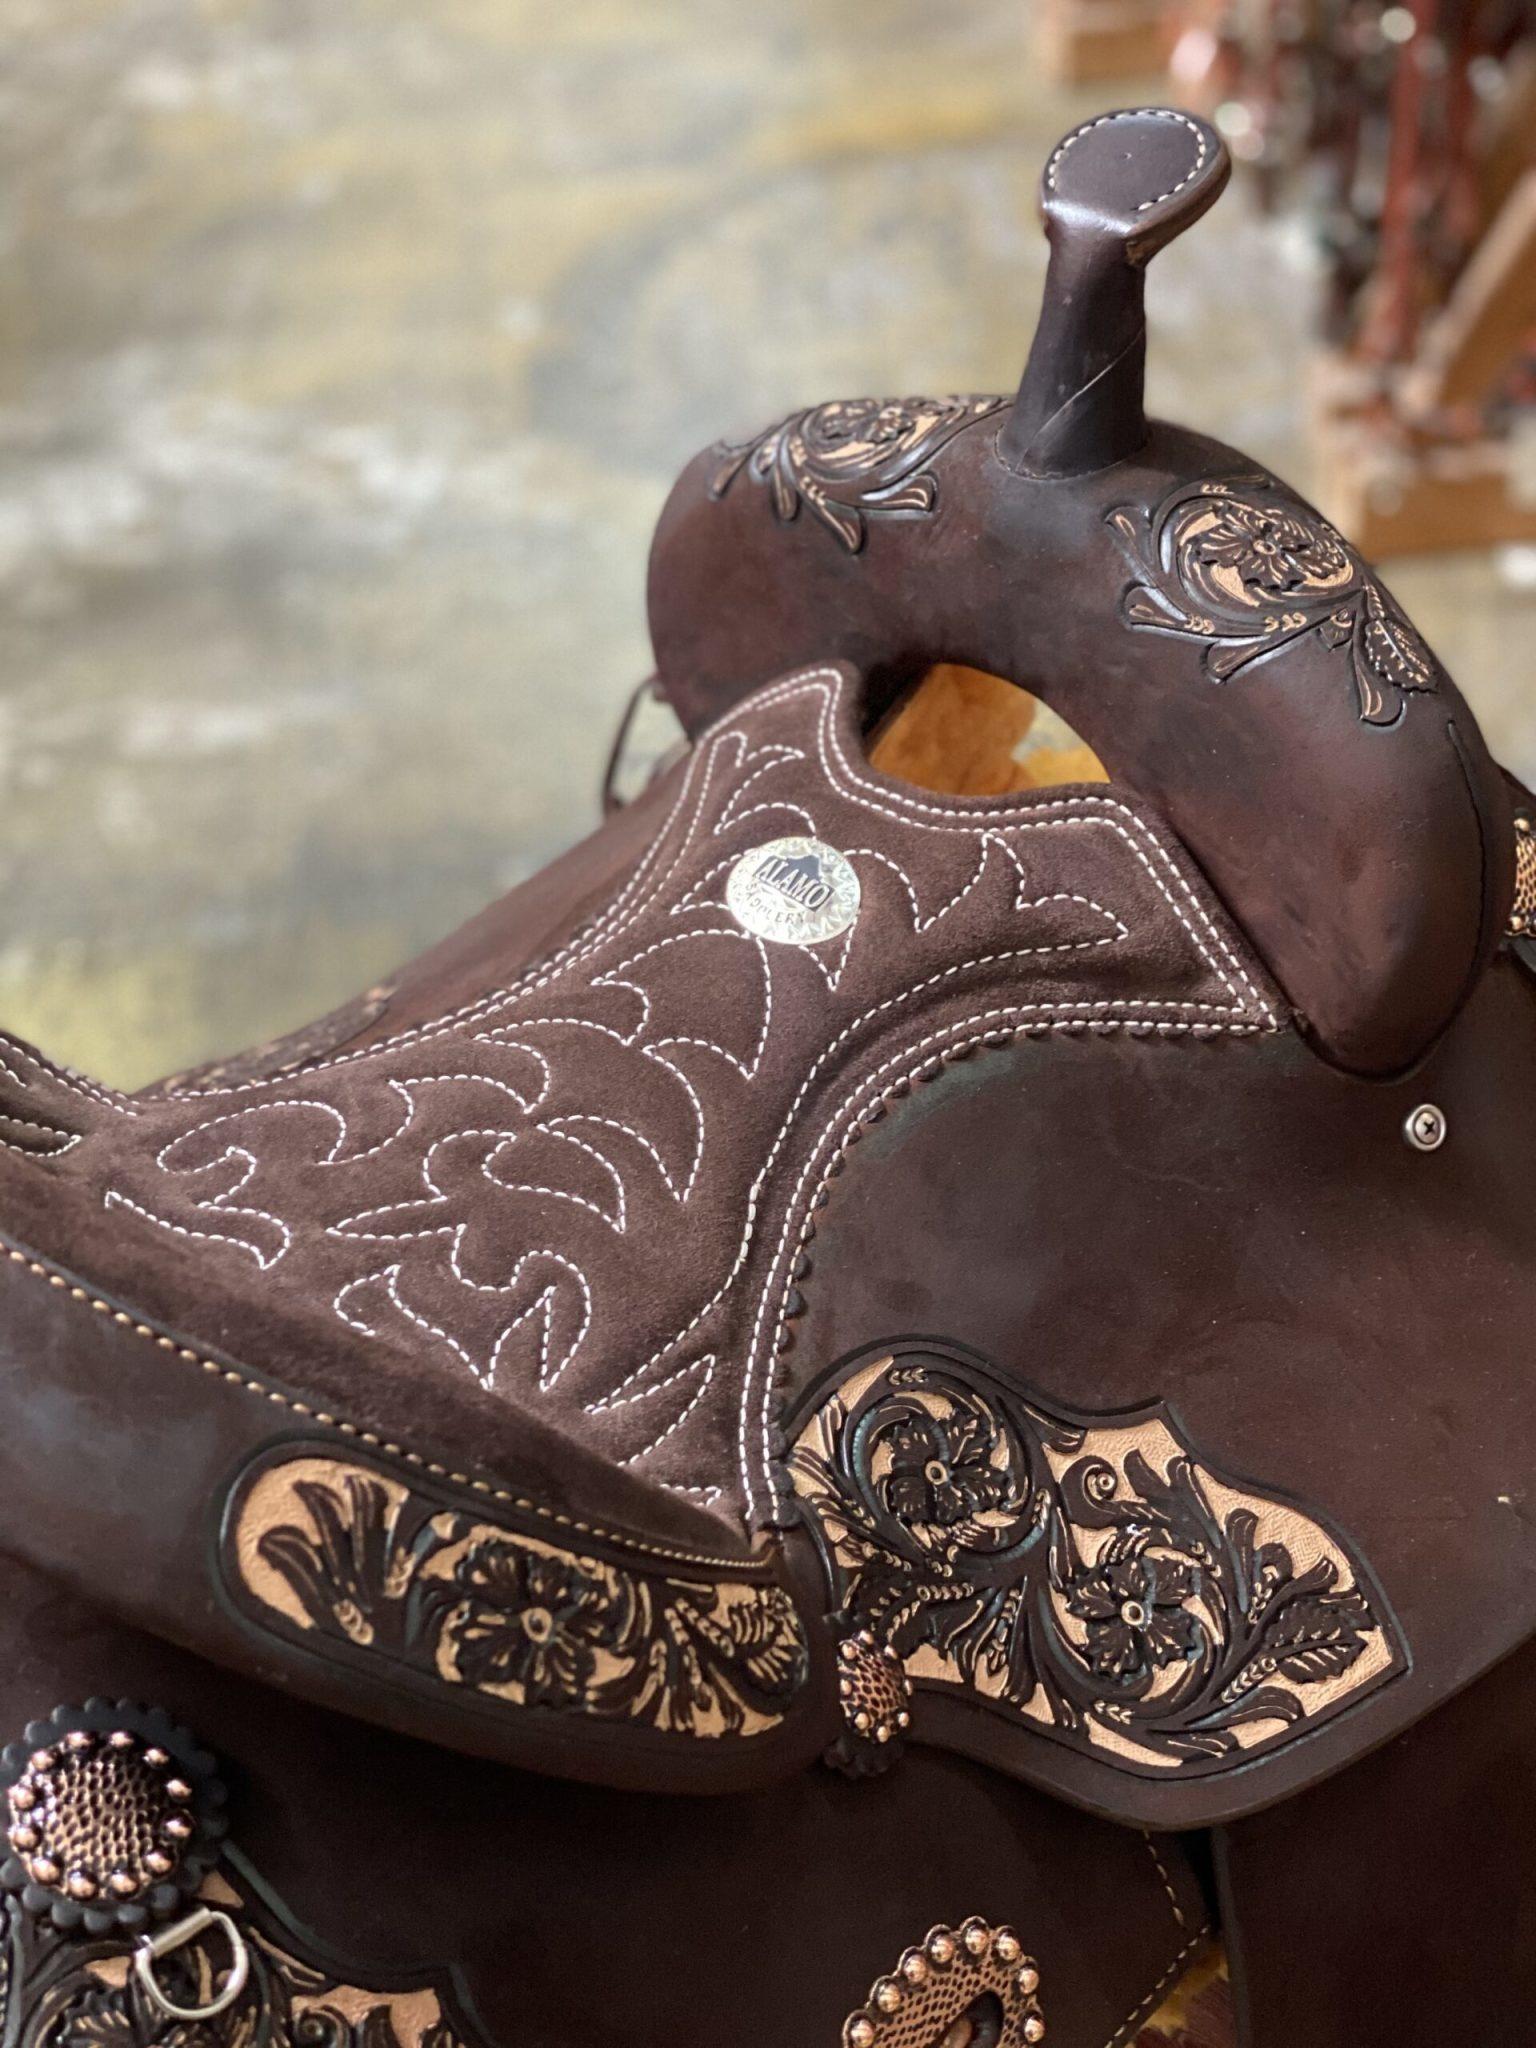 "Alamo 15"" Reg Bar Alamo IRO Barrel Saddle, Chocolate"